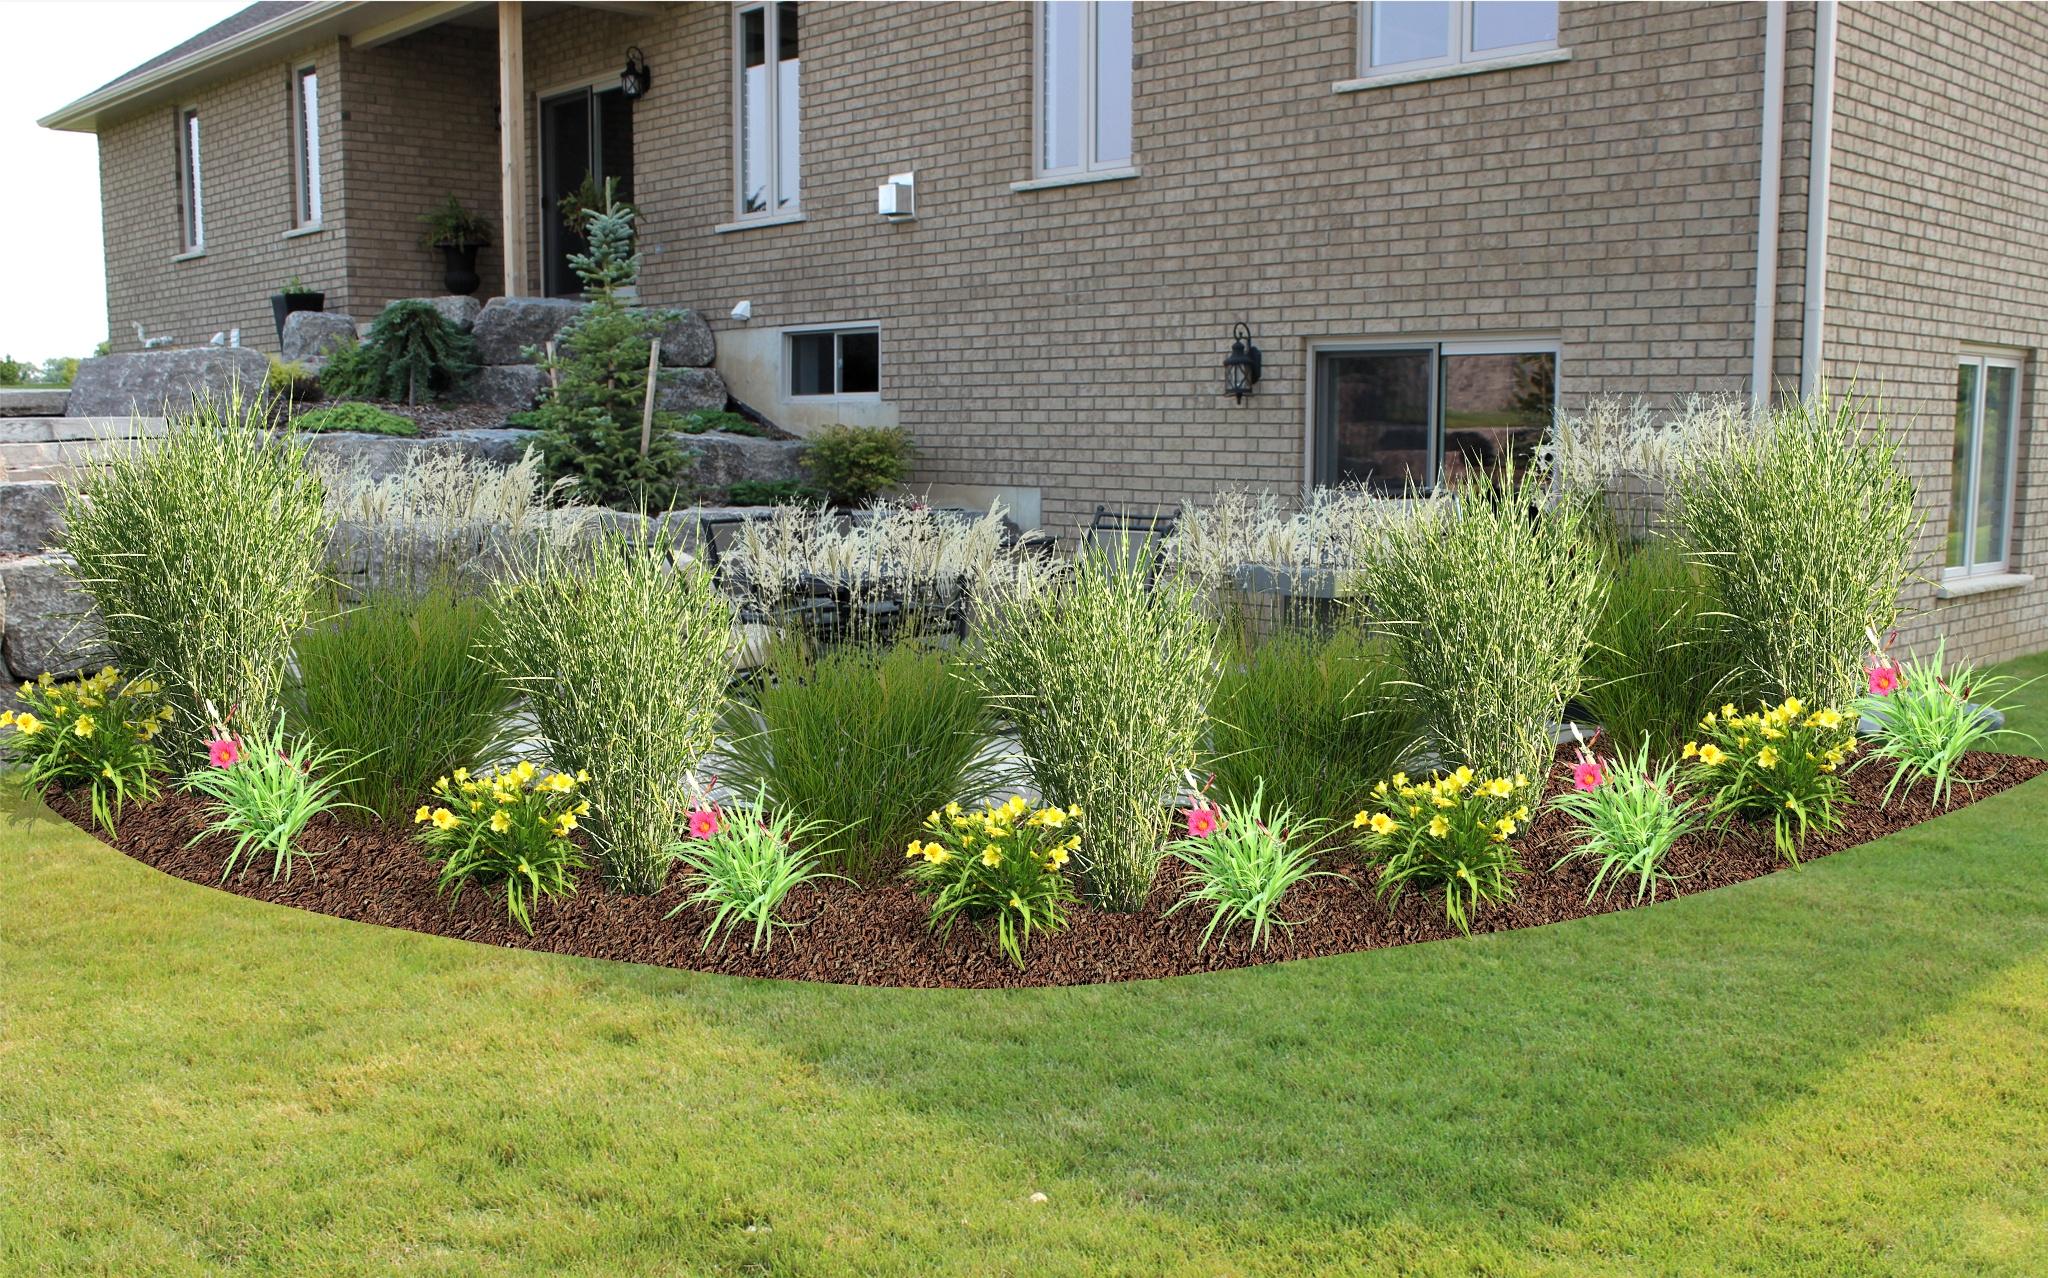 Ohs landscape group home landscaping in kit wat camb for Outside landscape group